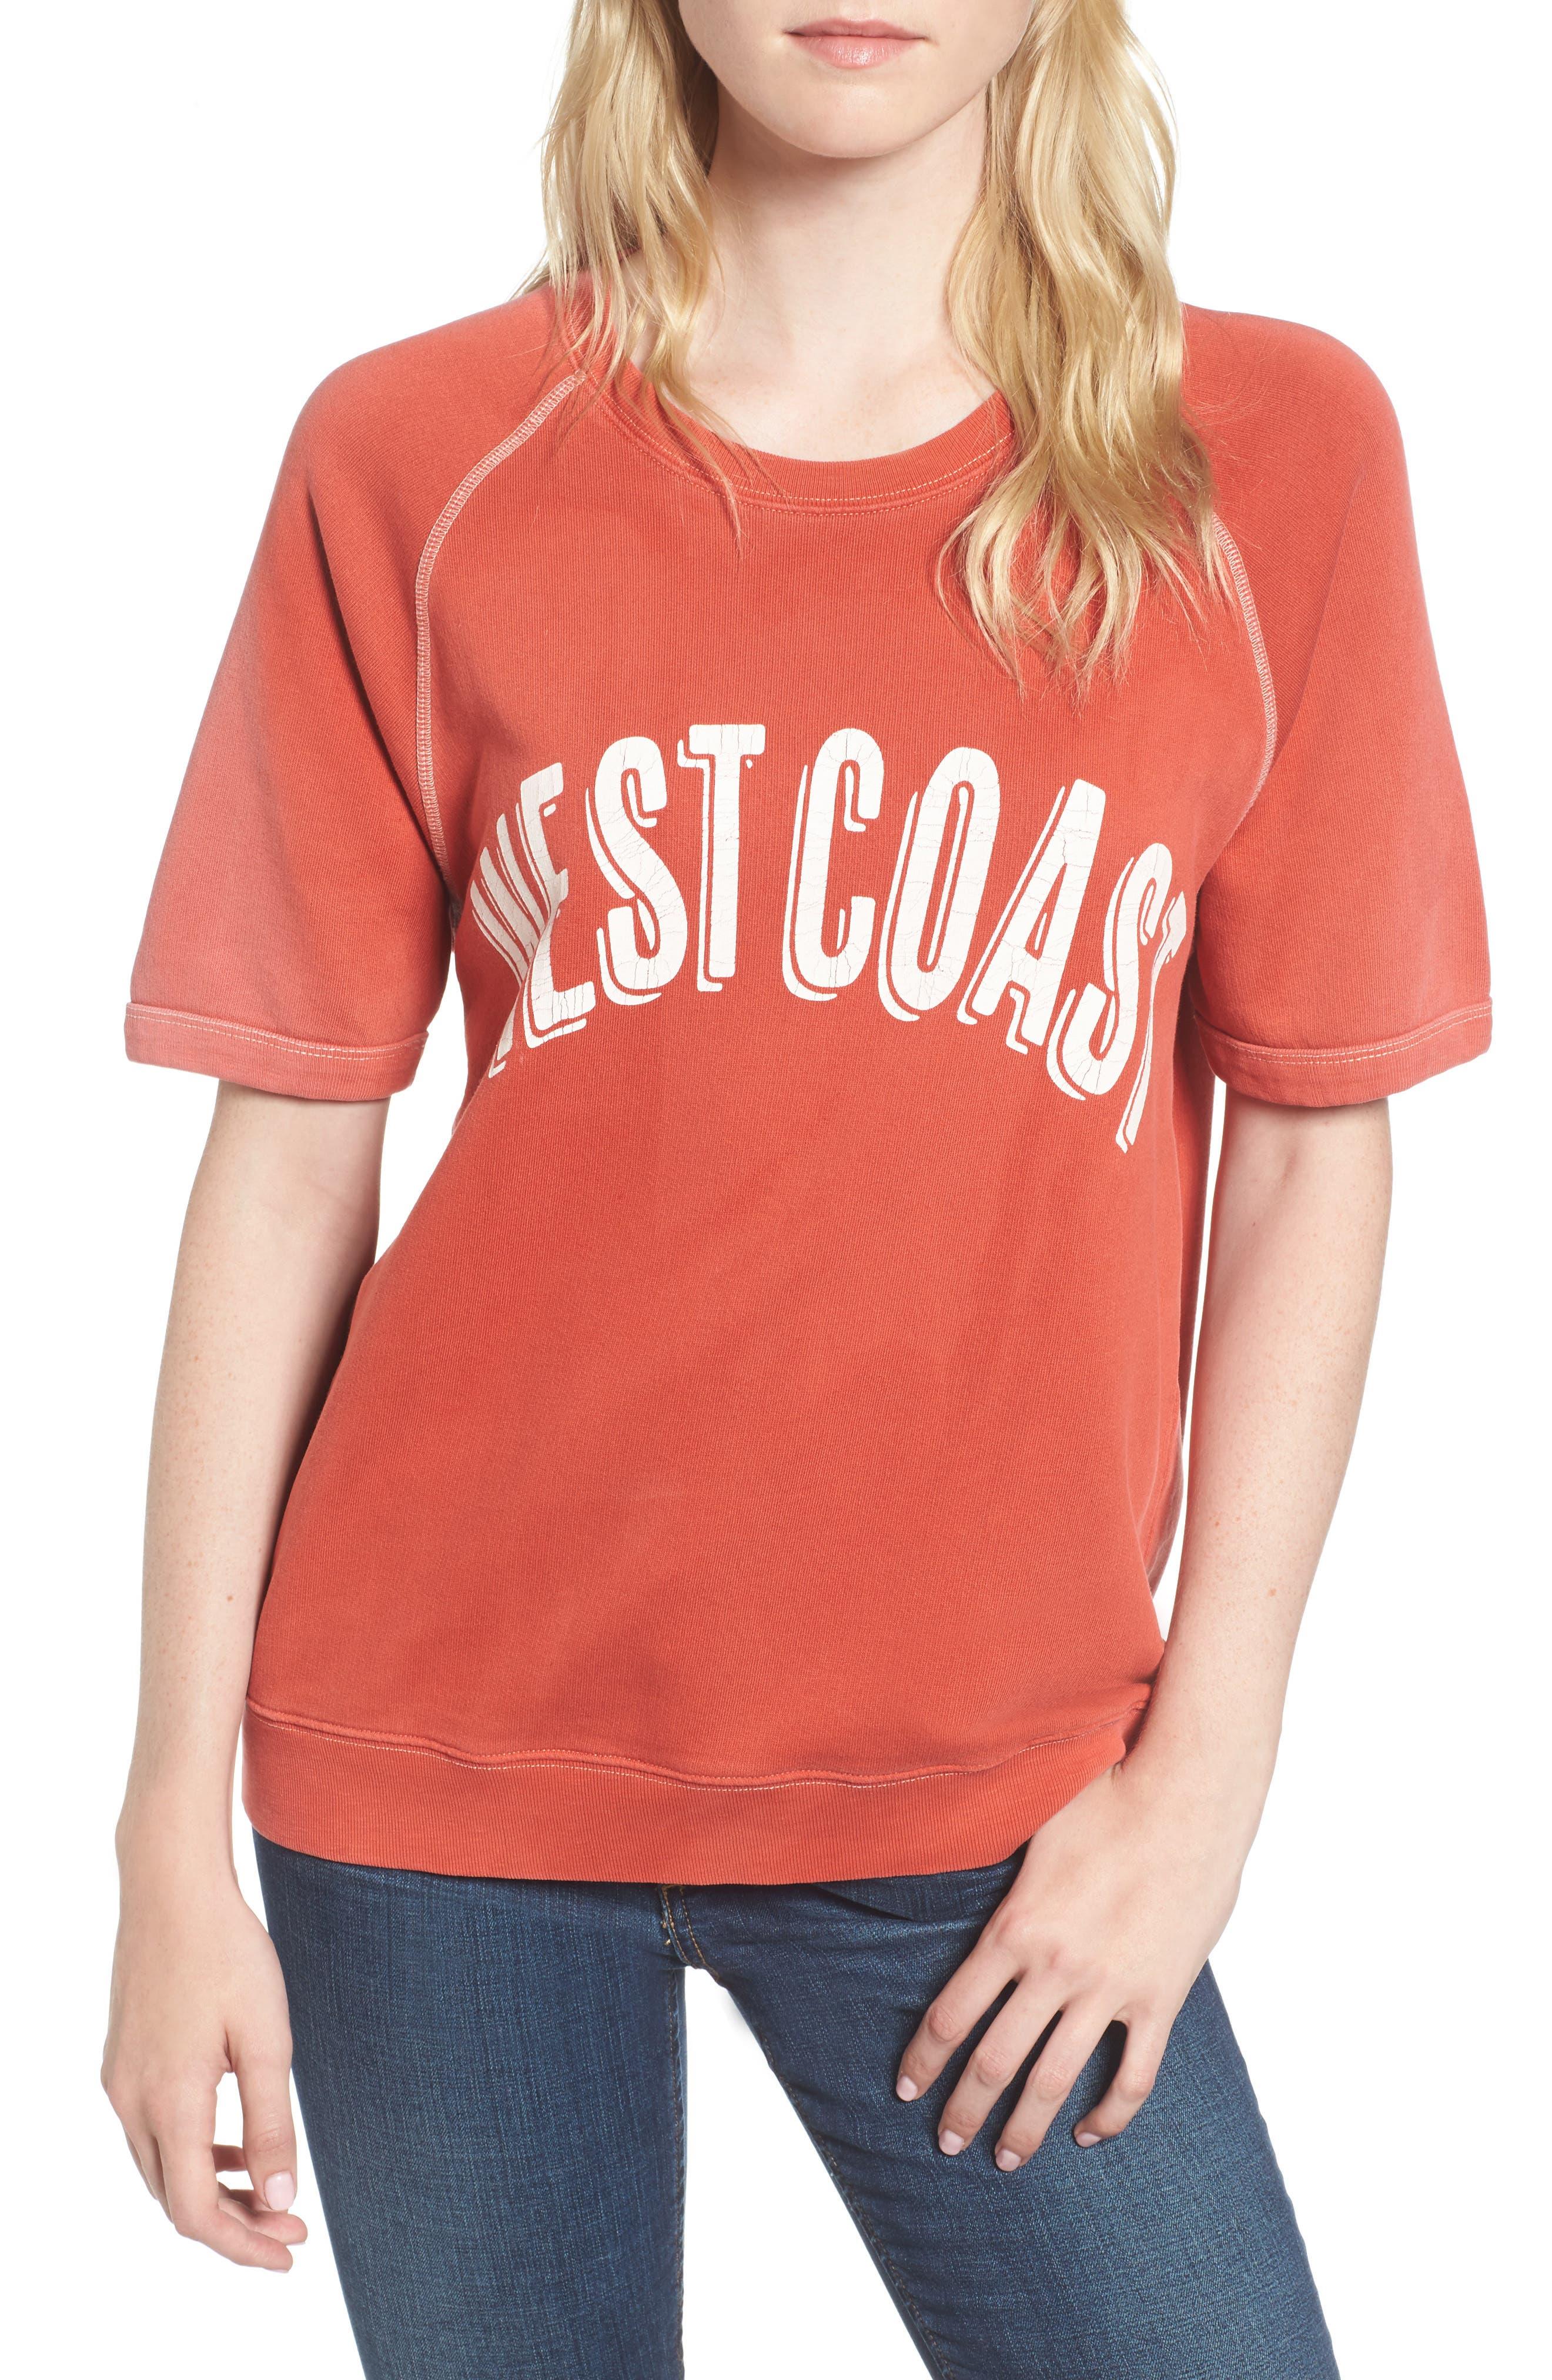 West Coast Sweatshirt,                         Main,                         color, Red